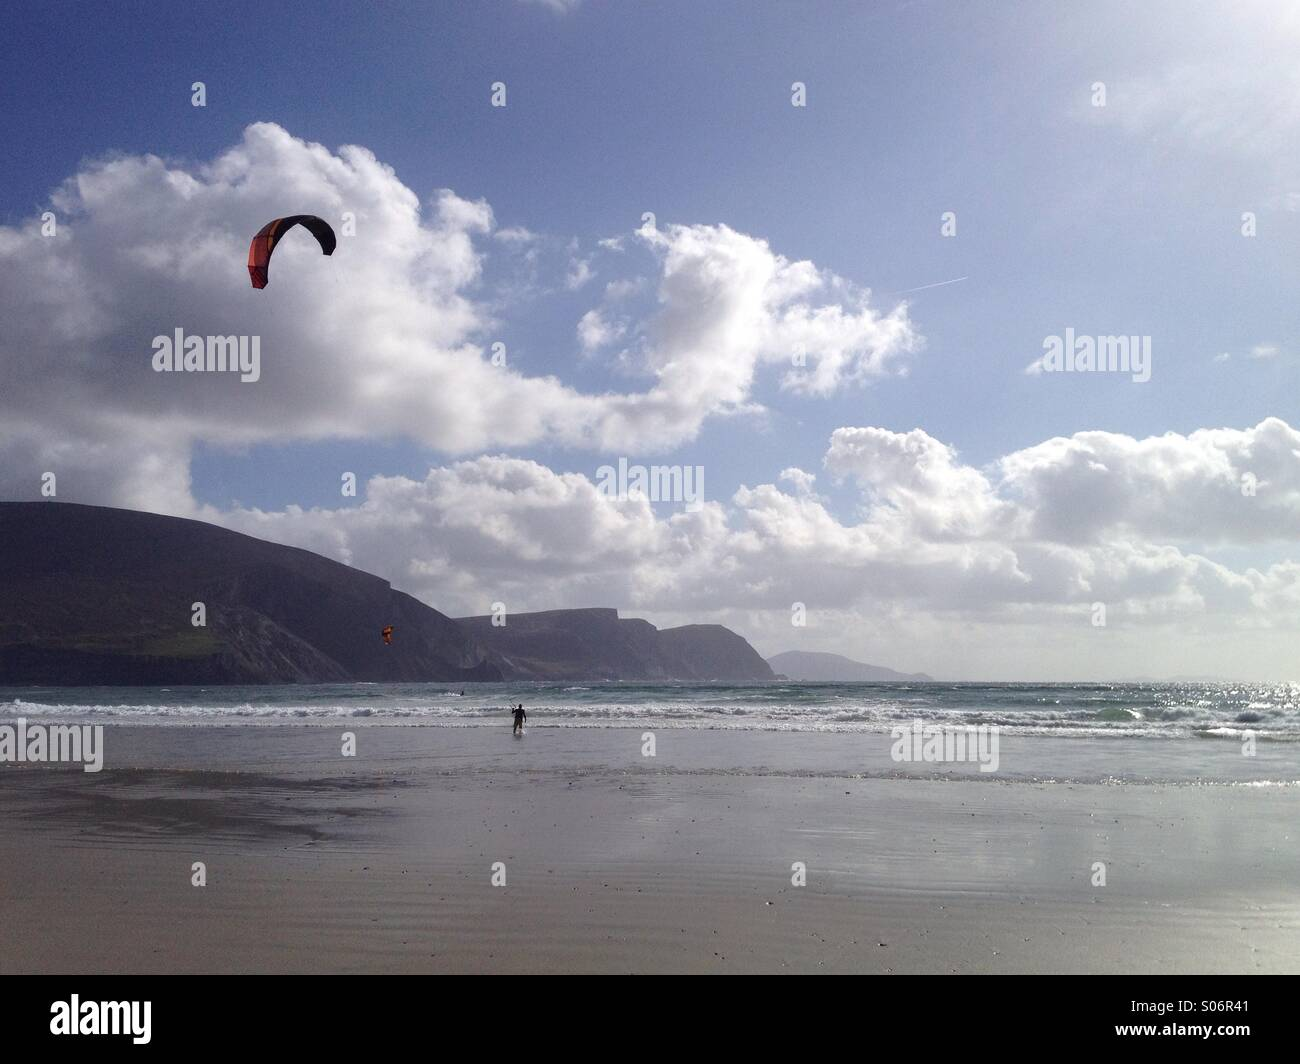 Kite surfers at Keel Beach, Achill Island, Mayo, Ireland, on the Wild Atlantic Way - Stock Image